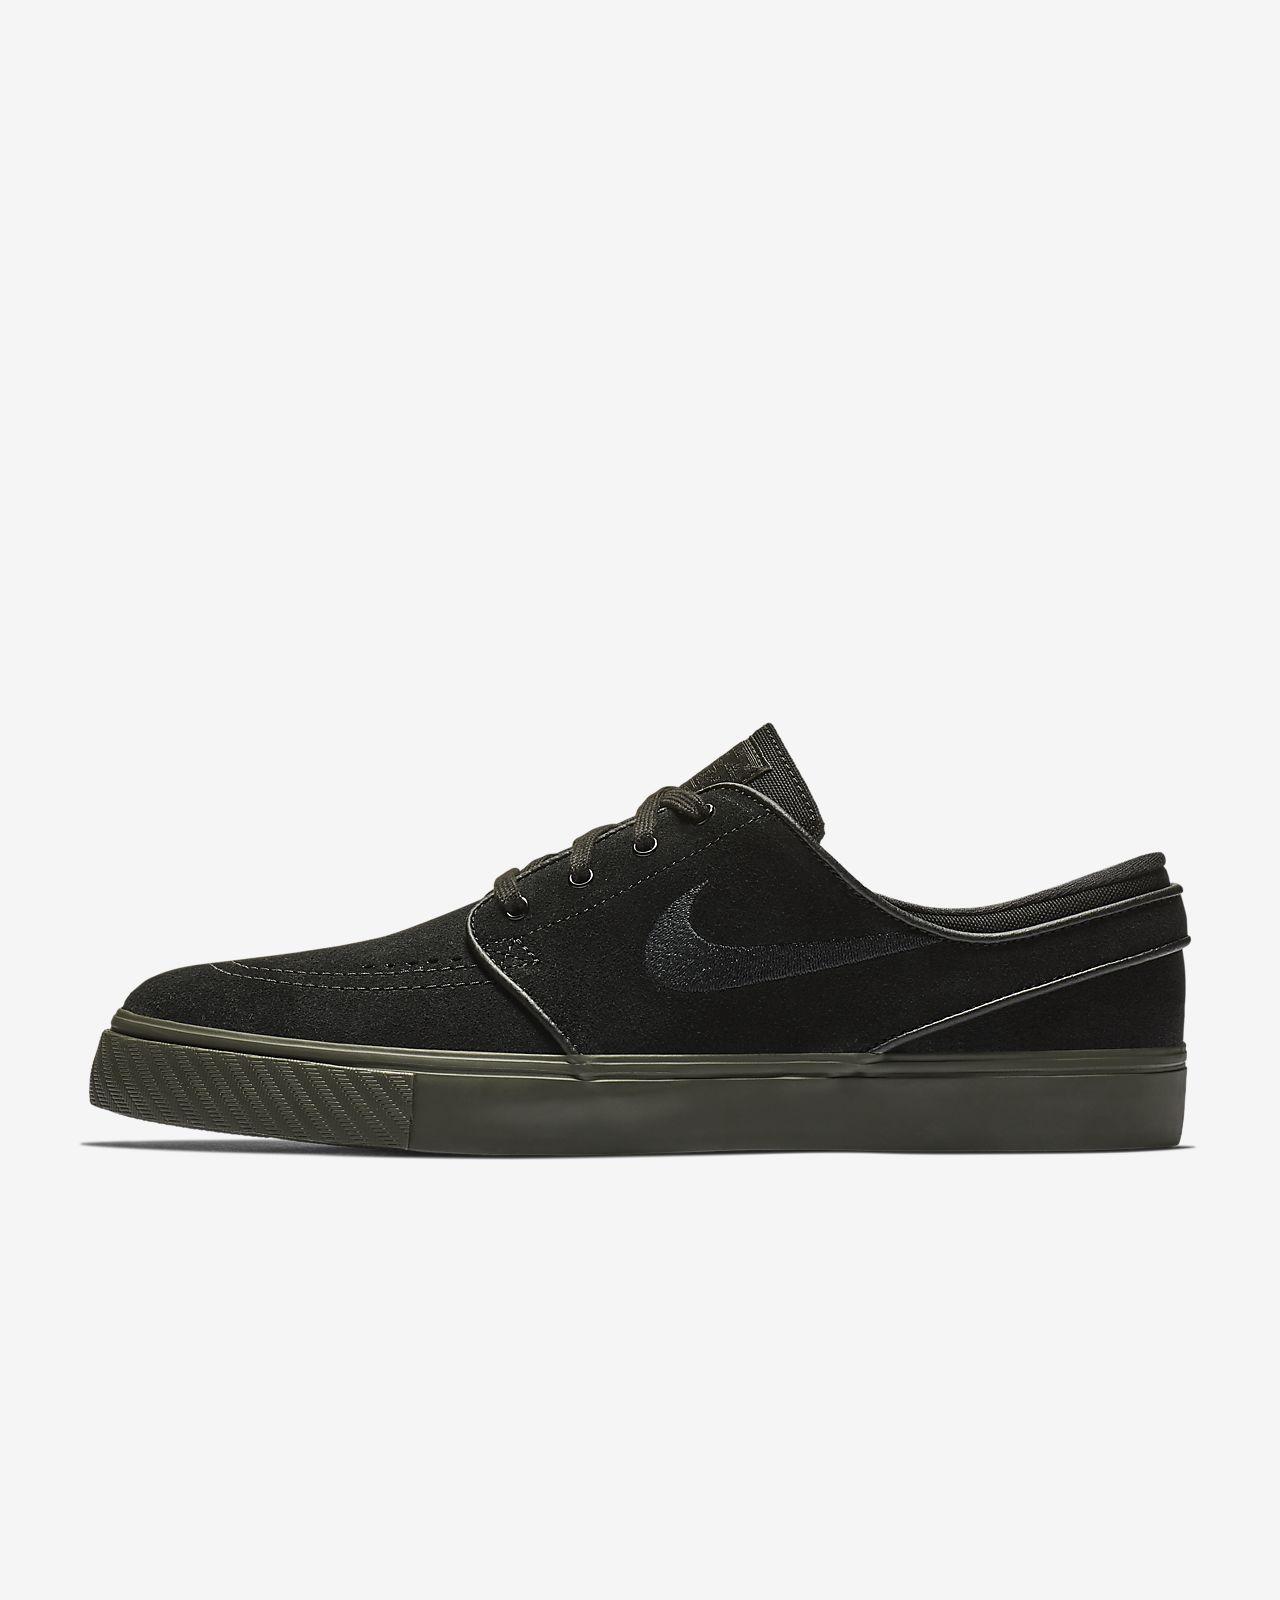 Nike De Homme Chaussure Janoski Skateboard Zoom Sb Stefan Pour qZPTyz